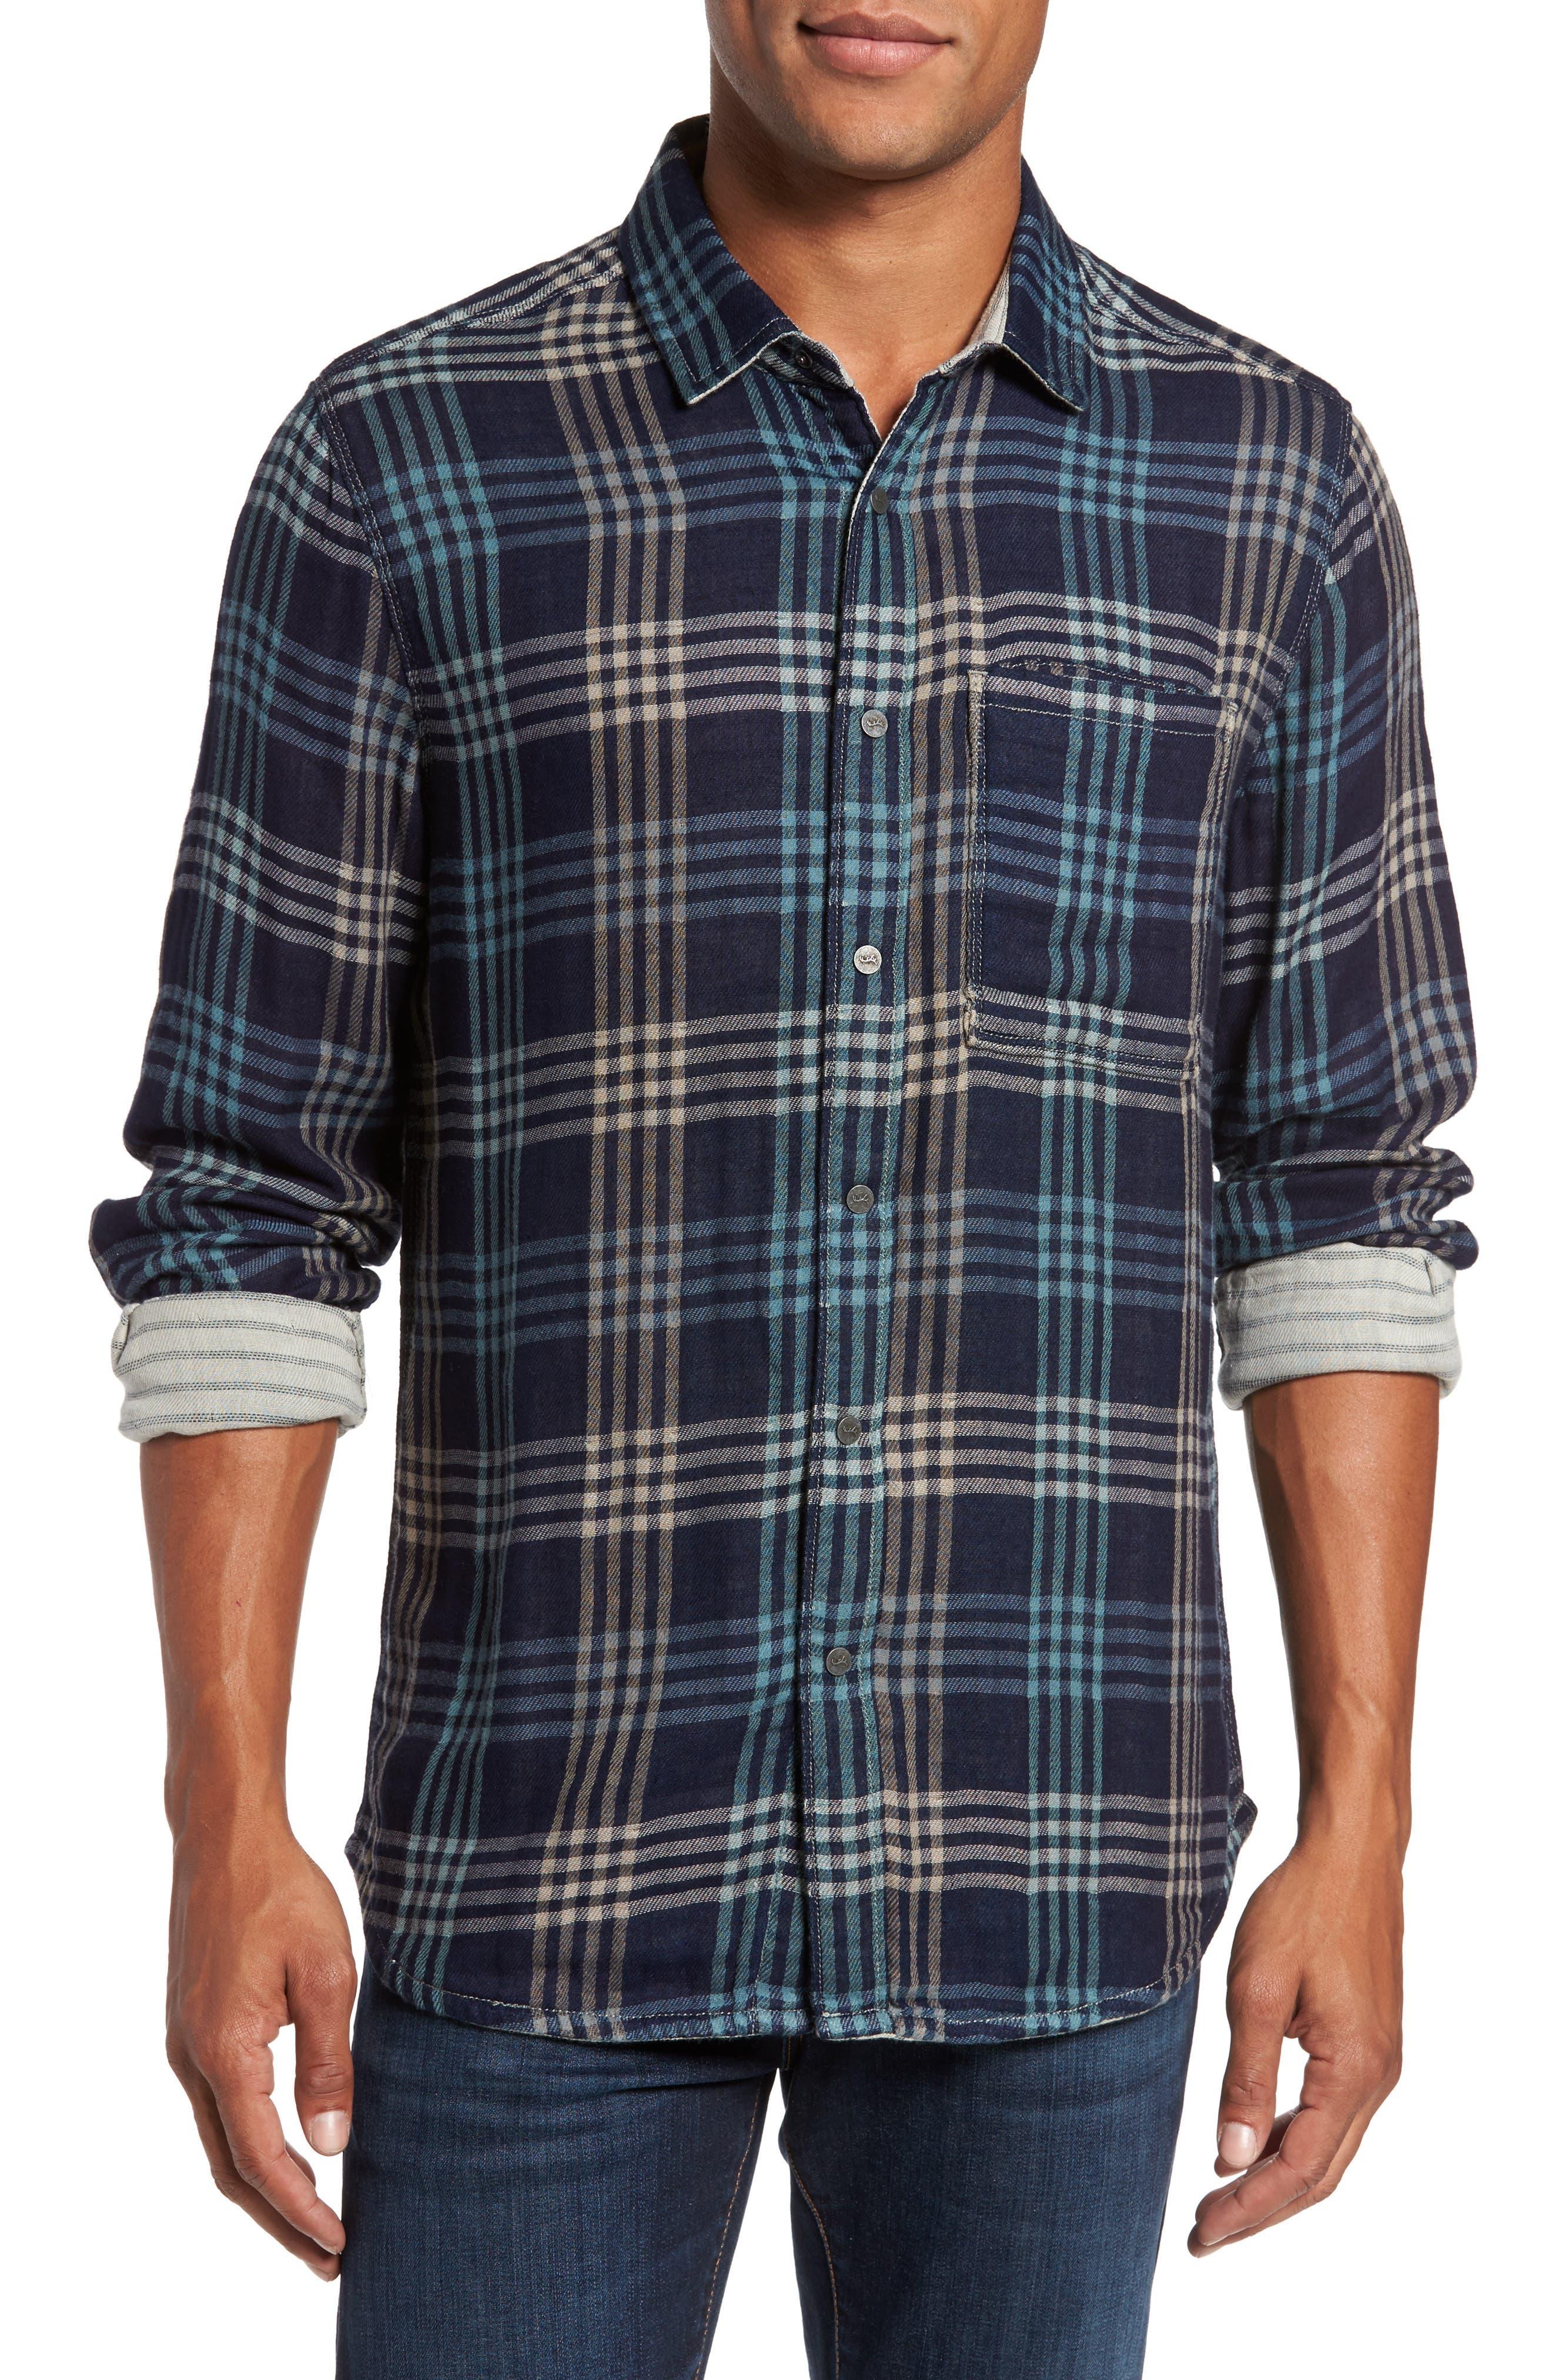 Main Image - Jeremiah Cypress Reversible Twill Shirt